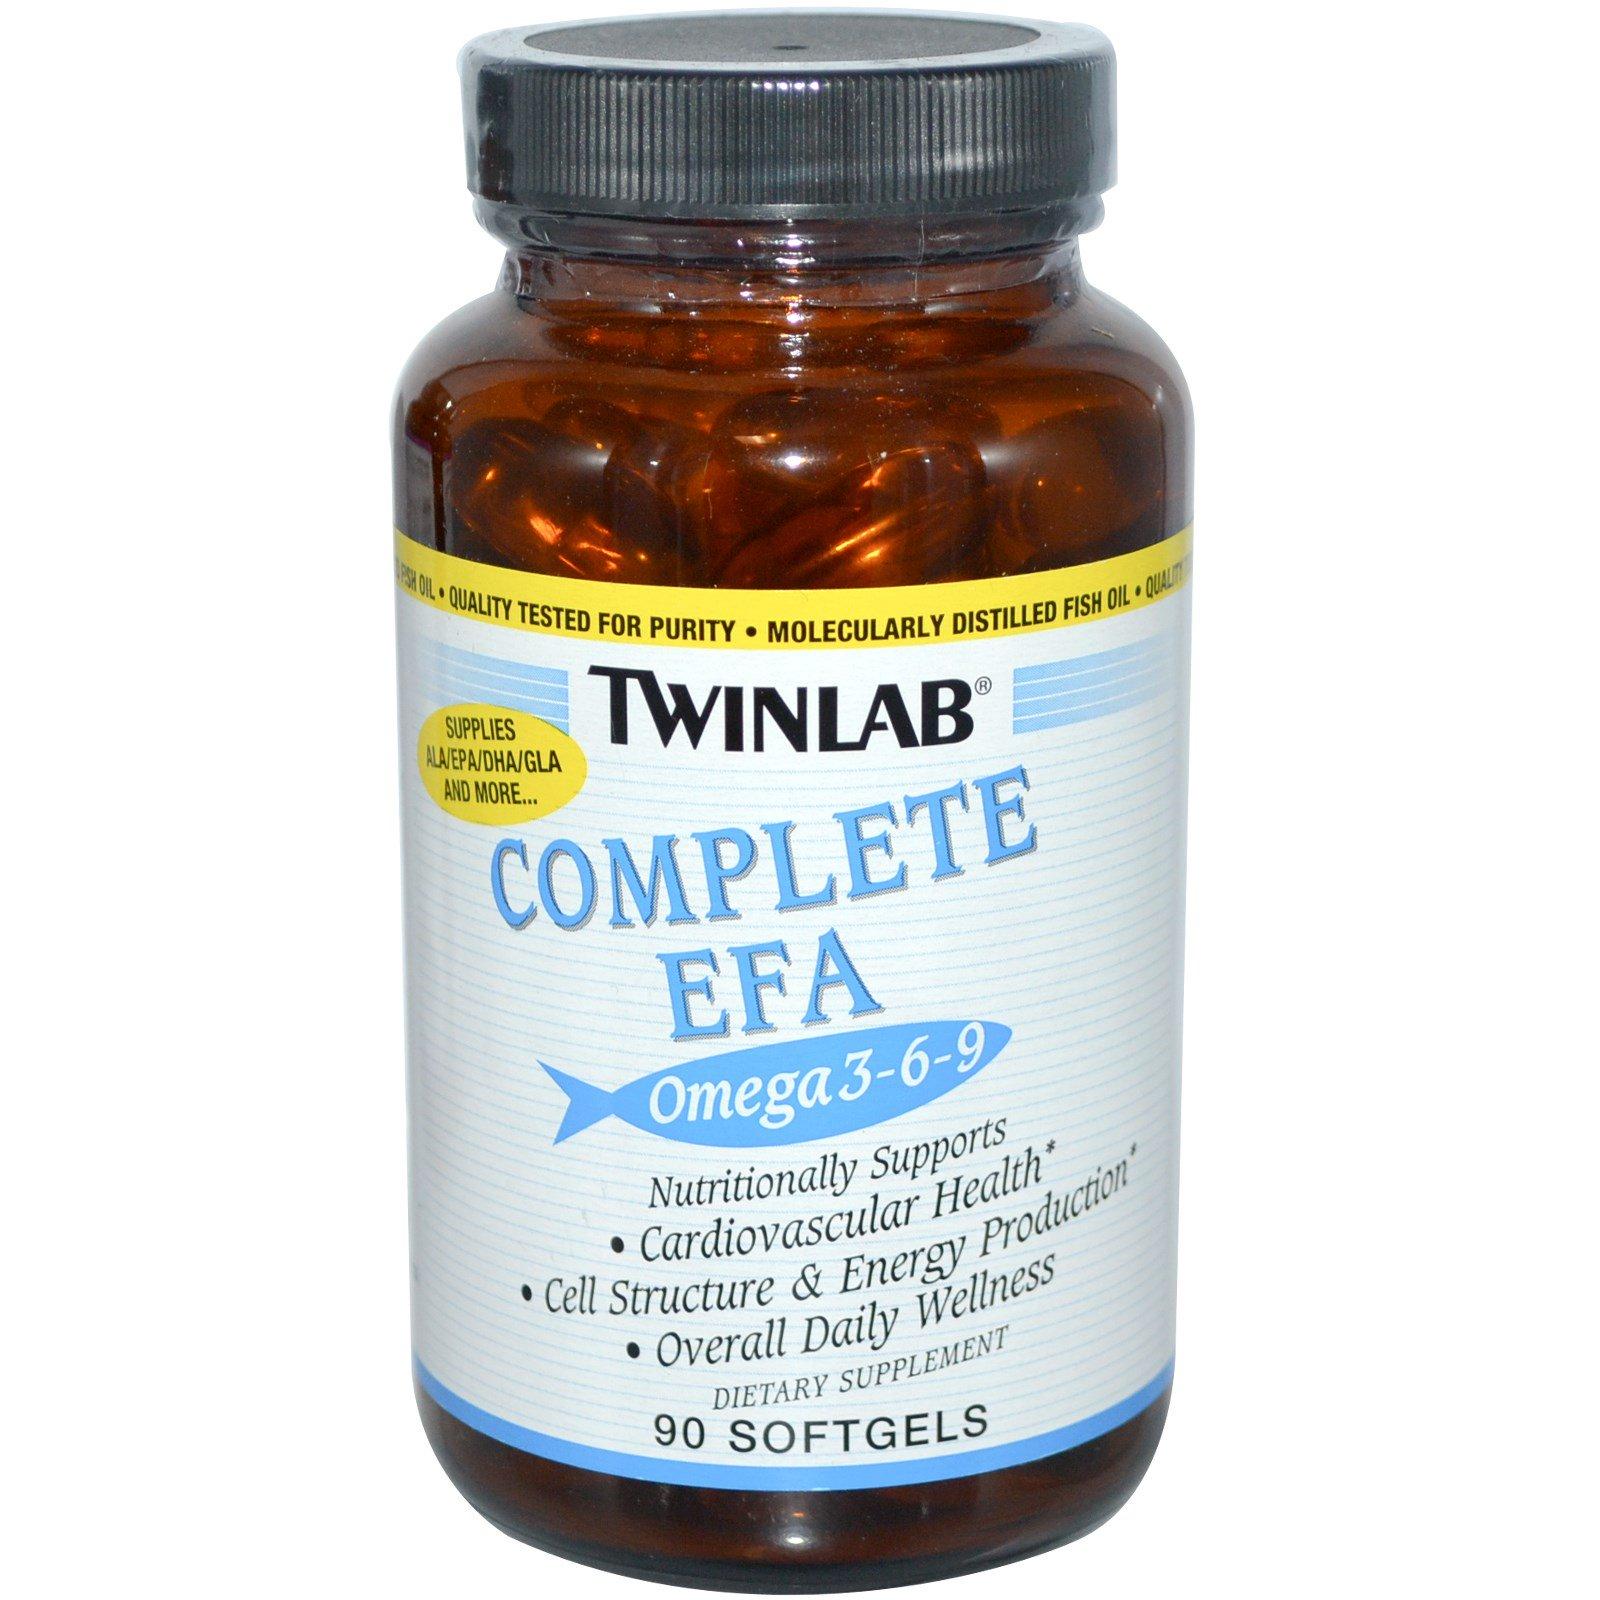 Twinlab, Complete EFA Омега 3-6-9, 90 капсул